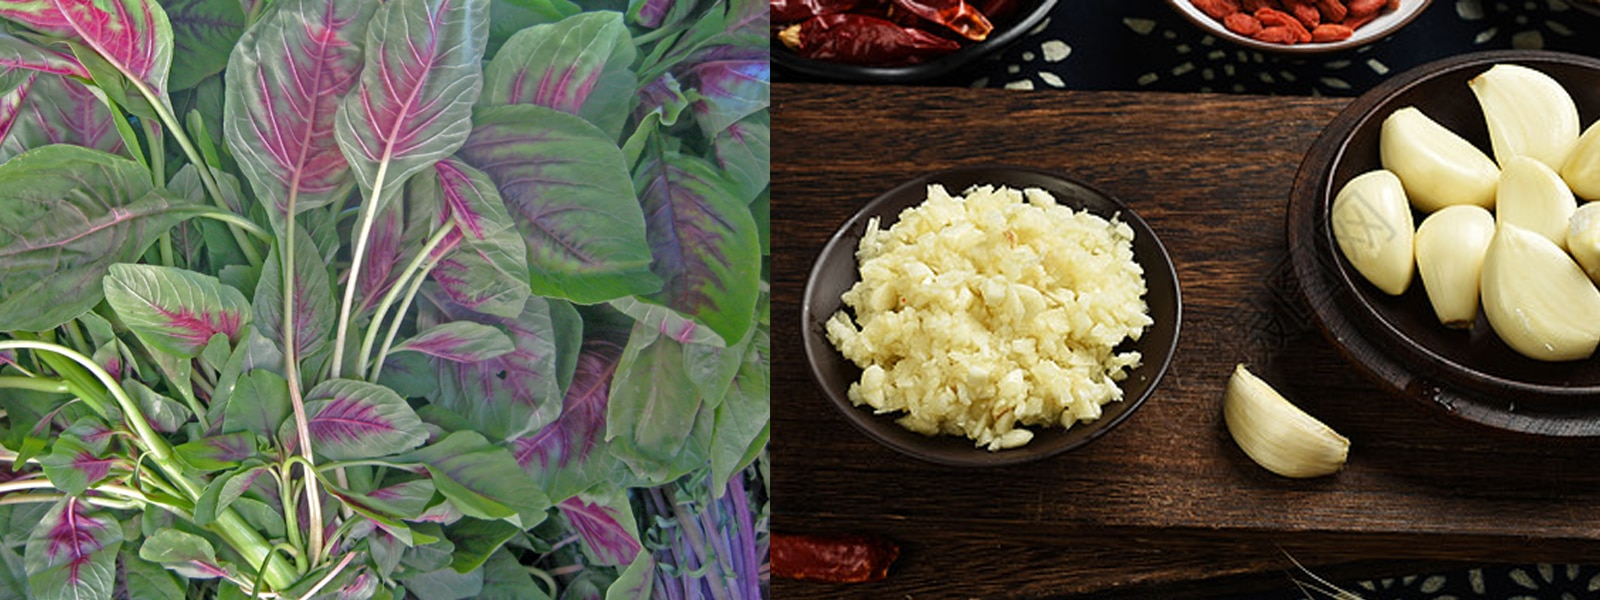 Amaranth and Garlic